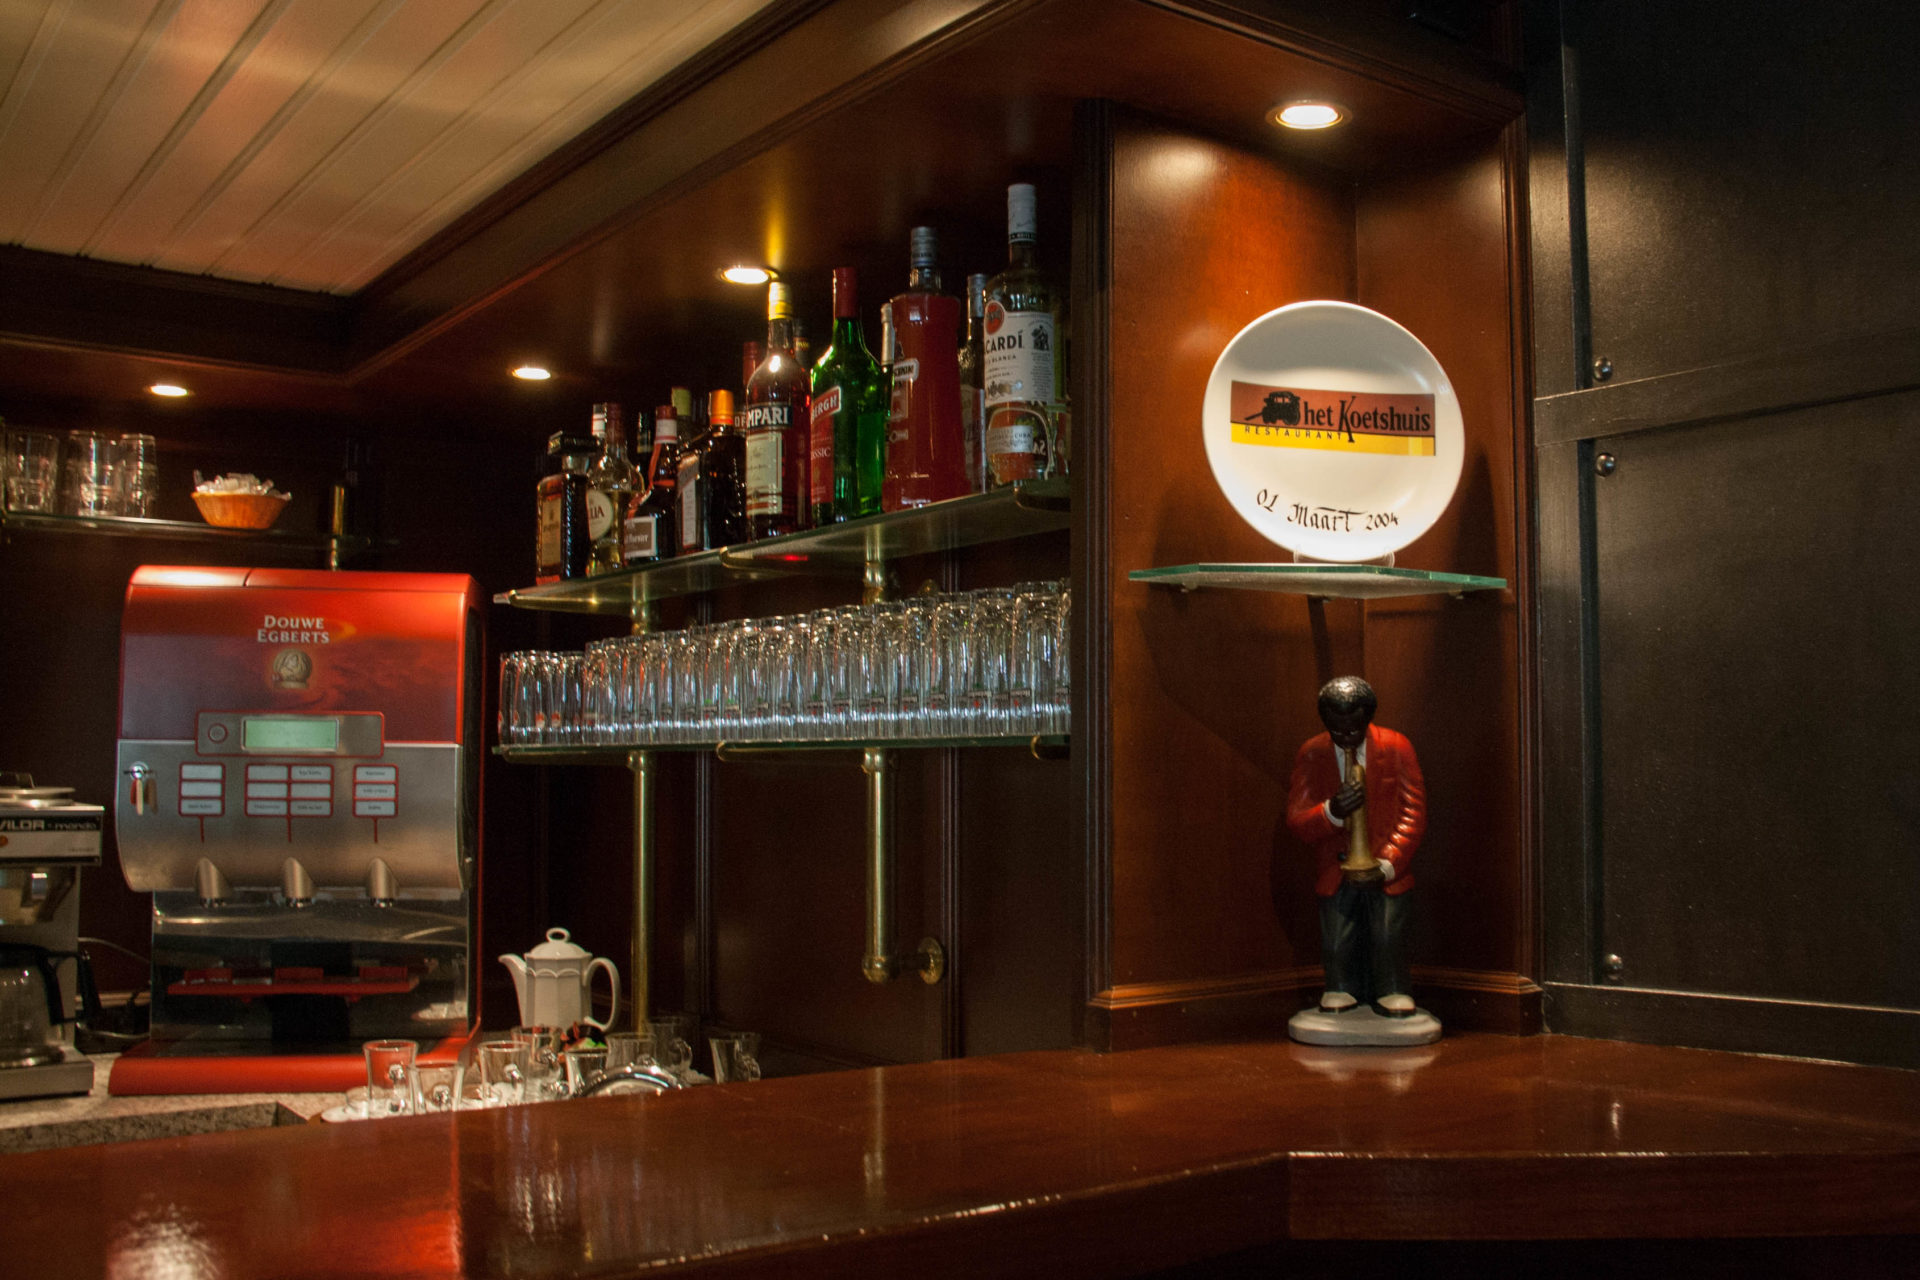 Koetsierskamer bar